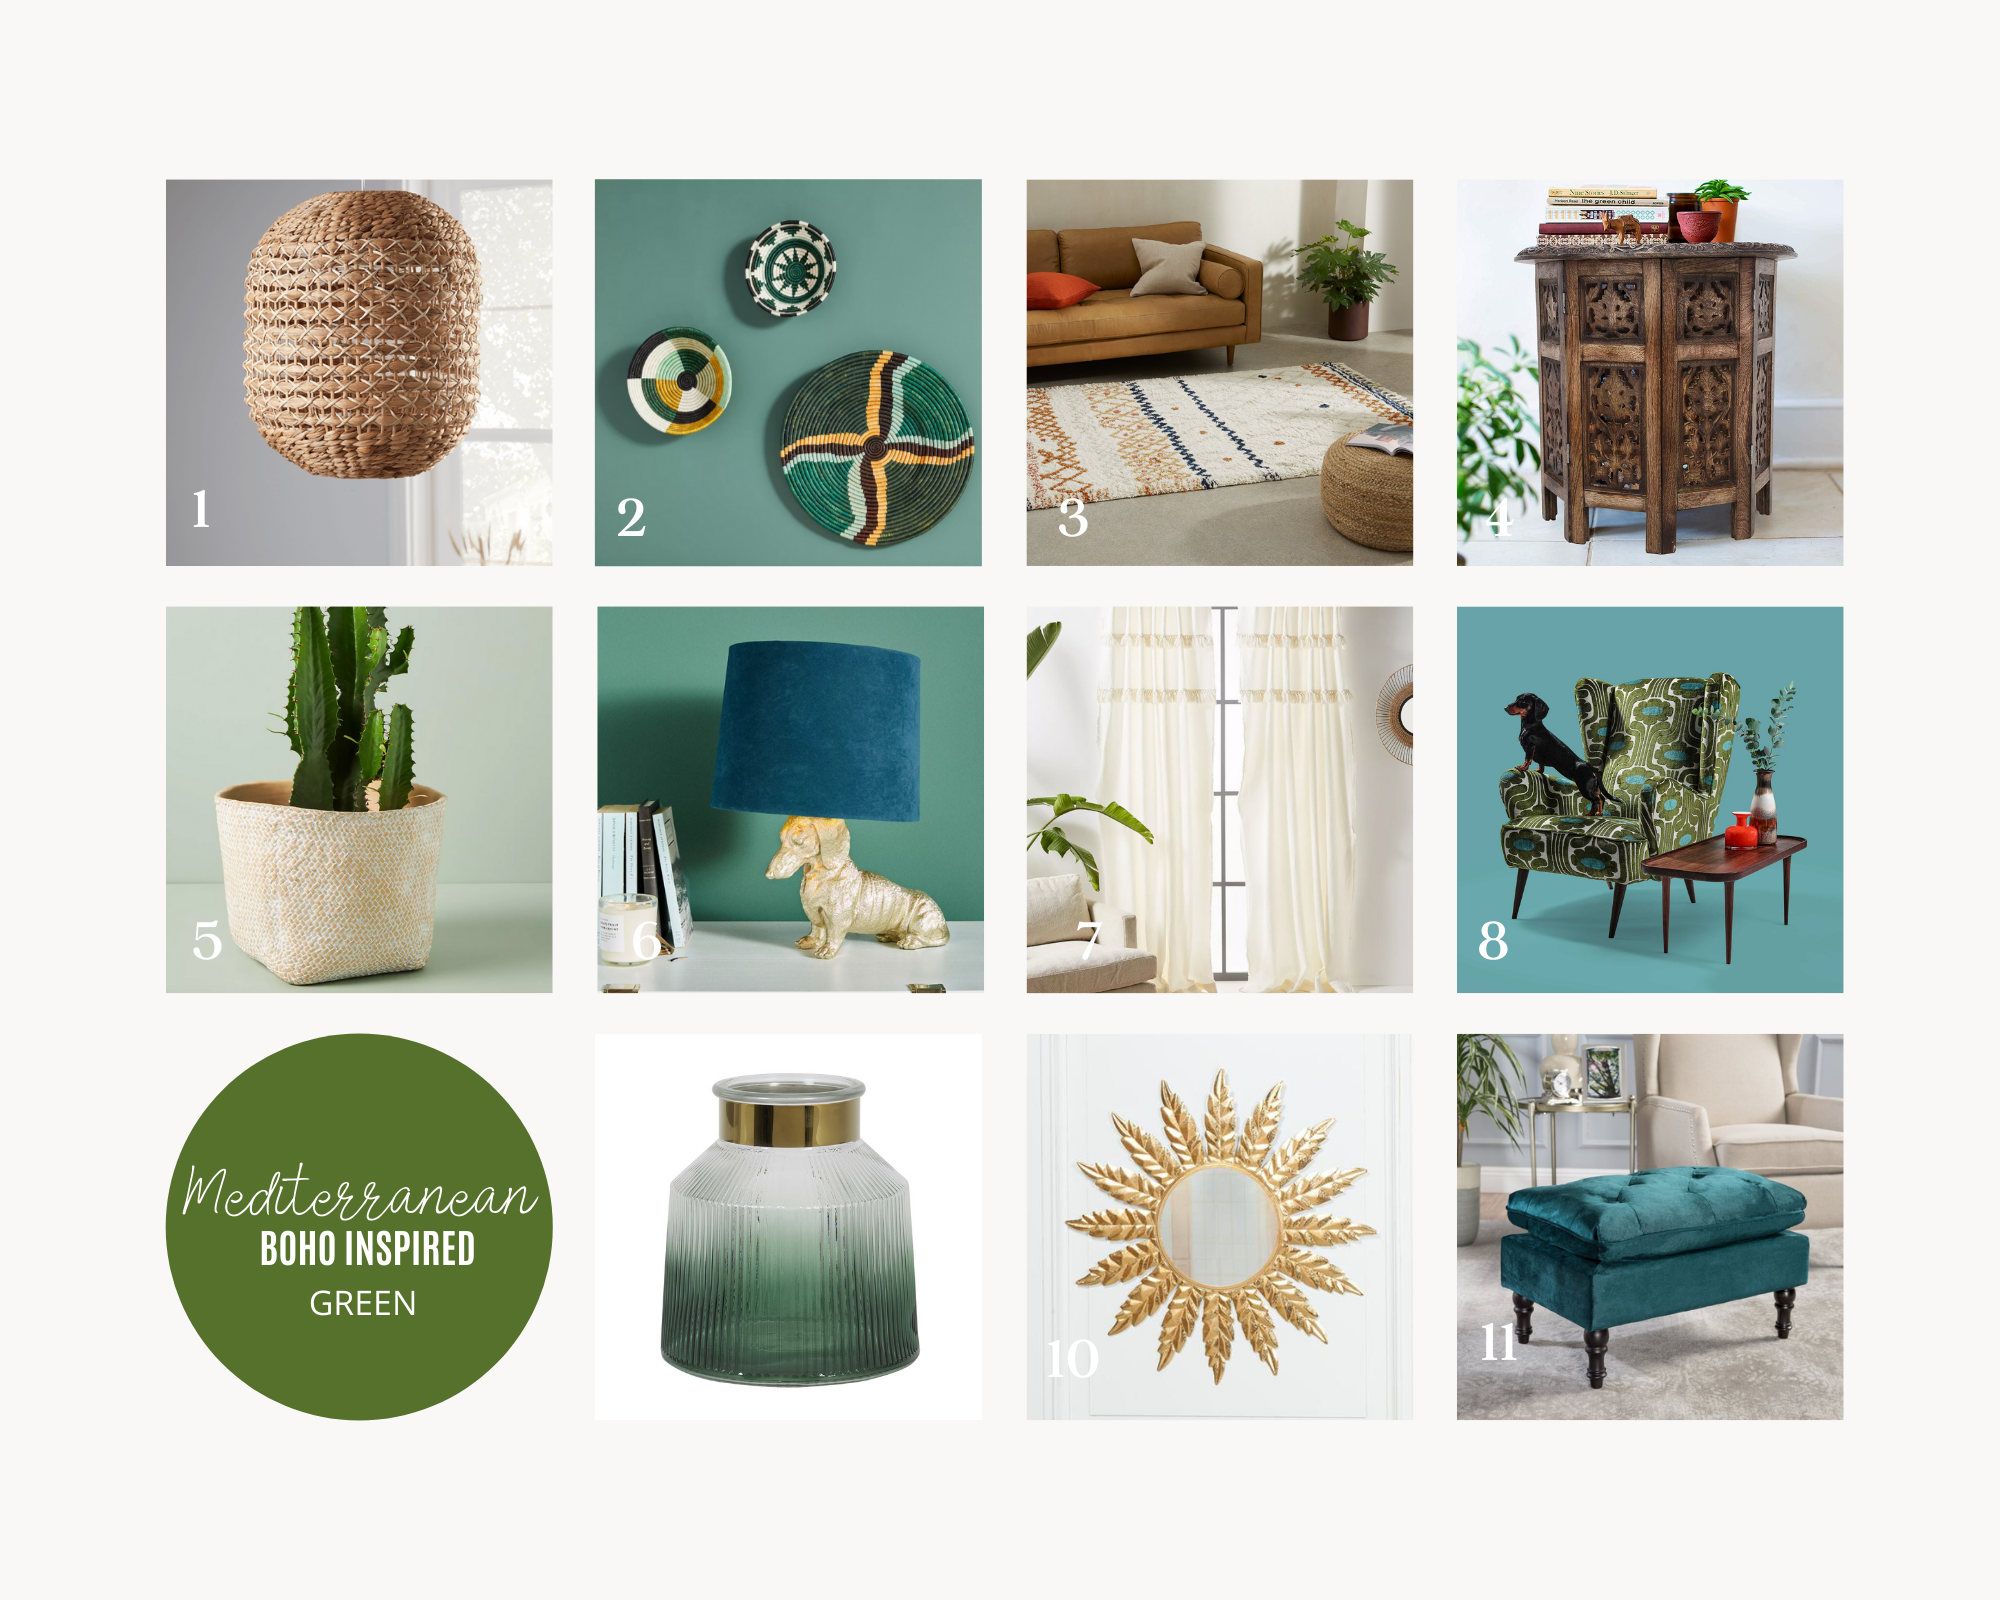 Mediterranean Boho Inspired Home Accessories Green